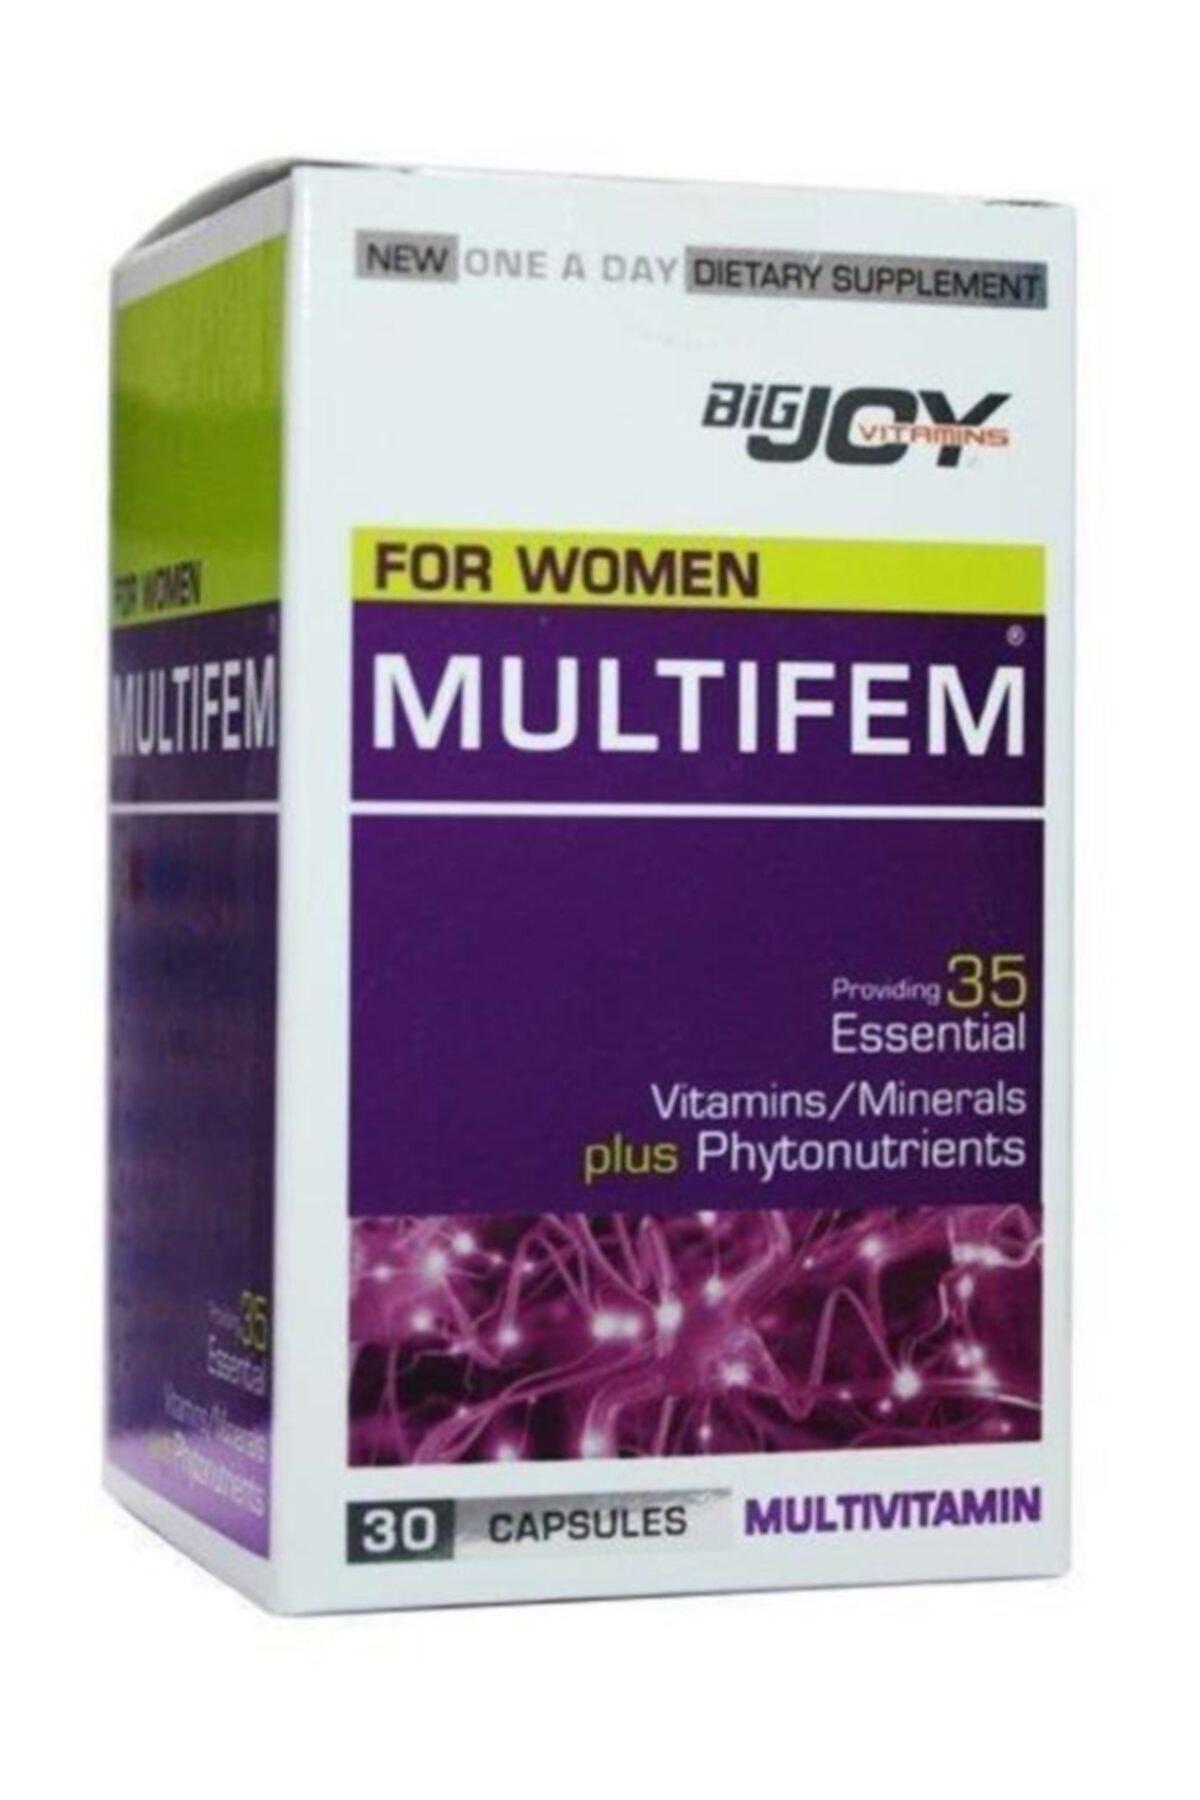 Big Joy Multifem Multivitamin 30 Kapsül 1